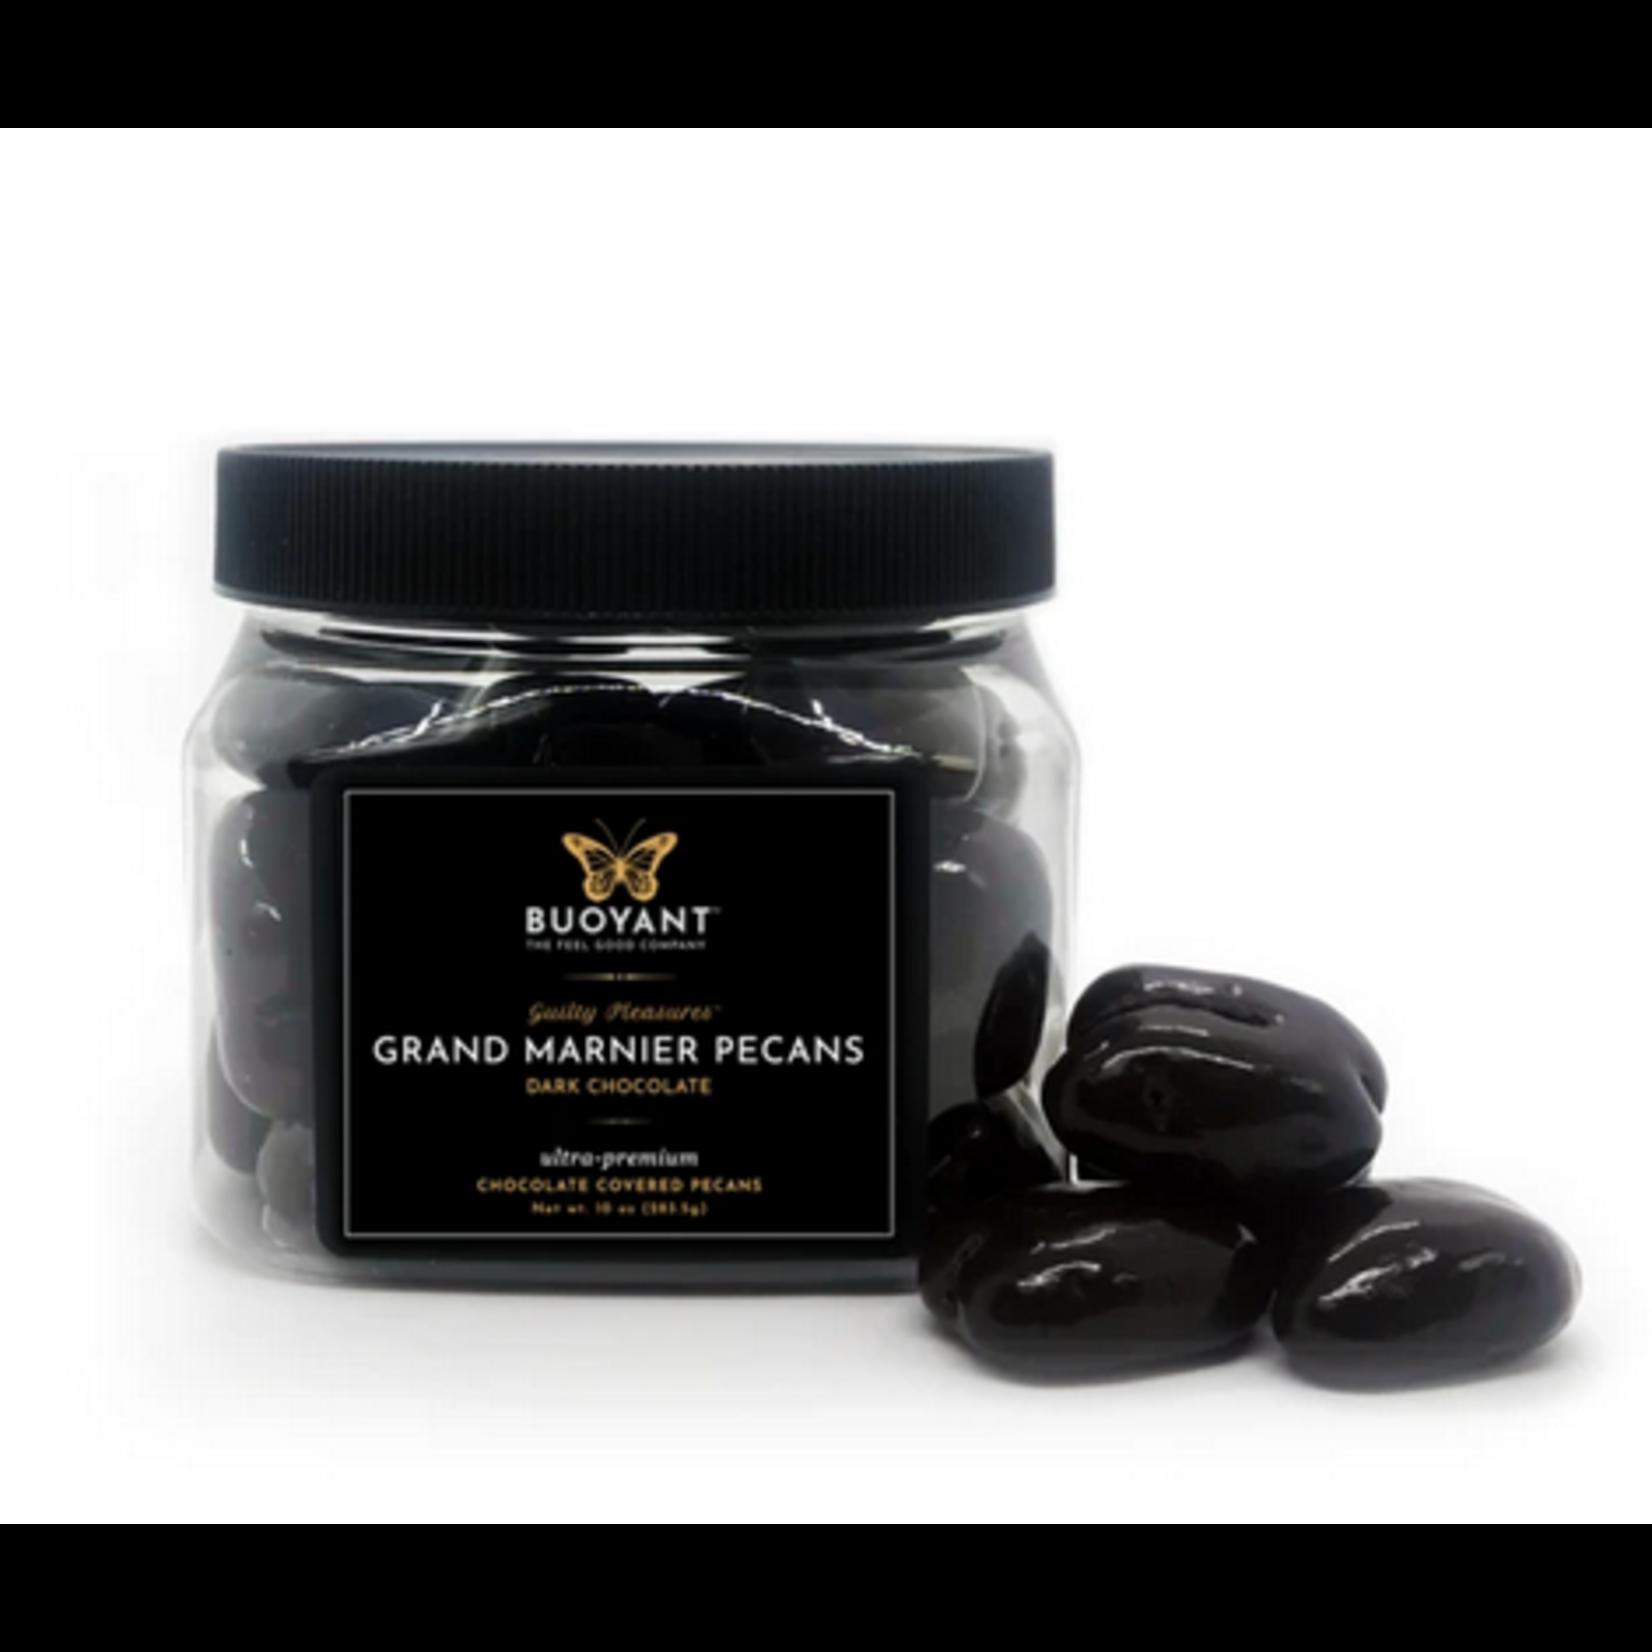 Buoyant Brands Buoyant Grand Marnier Pecans - Dark Chocolate